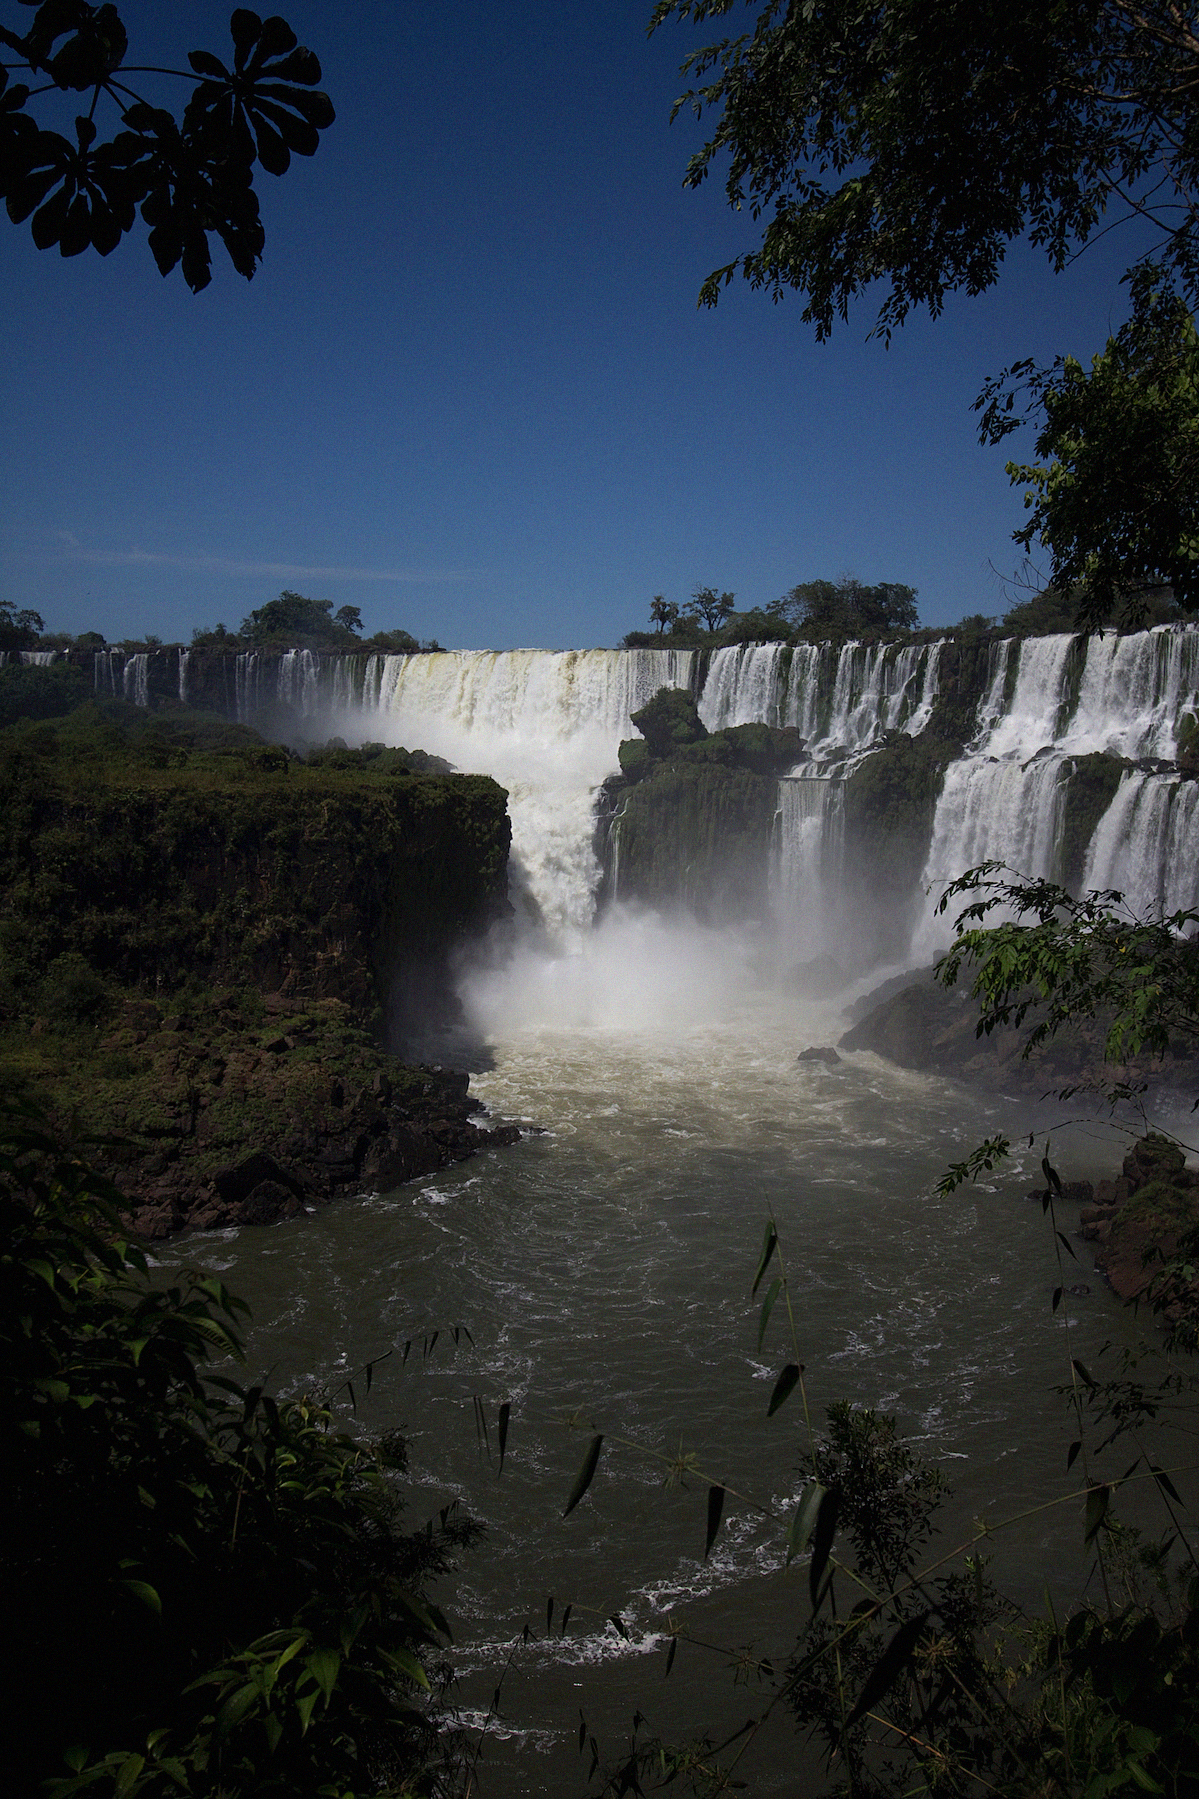 Iguazu Cataratas de Iguazu waterfalls Buenos Aires Sightseeing Argentinia Argentinien South America28